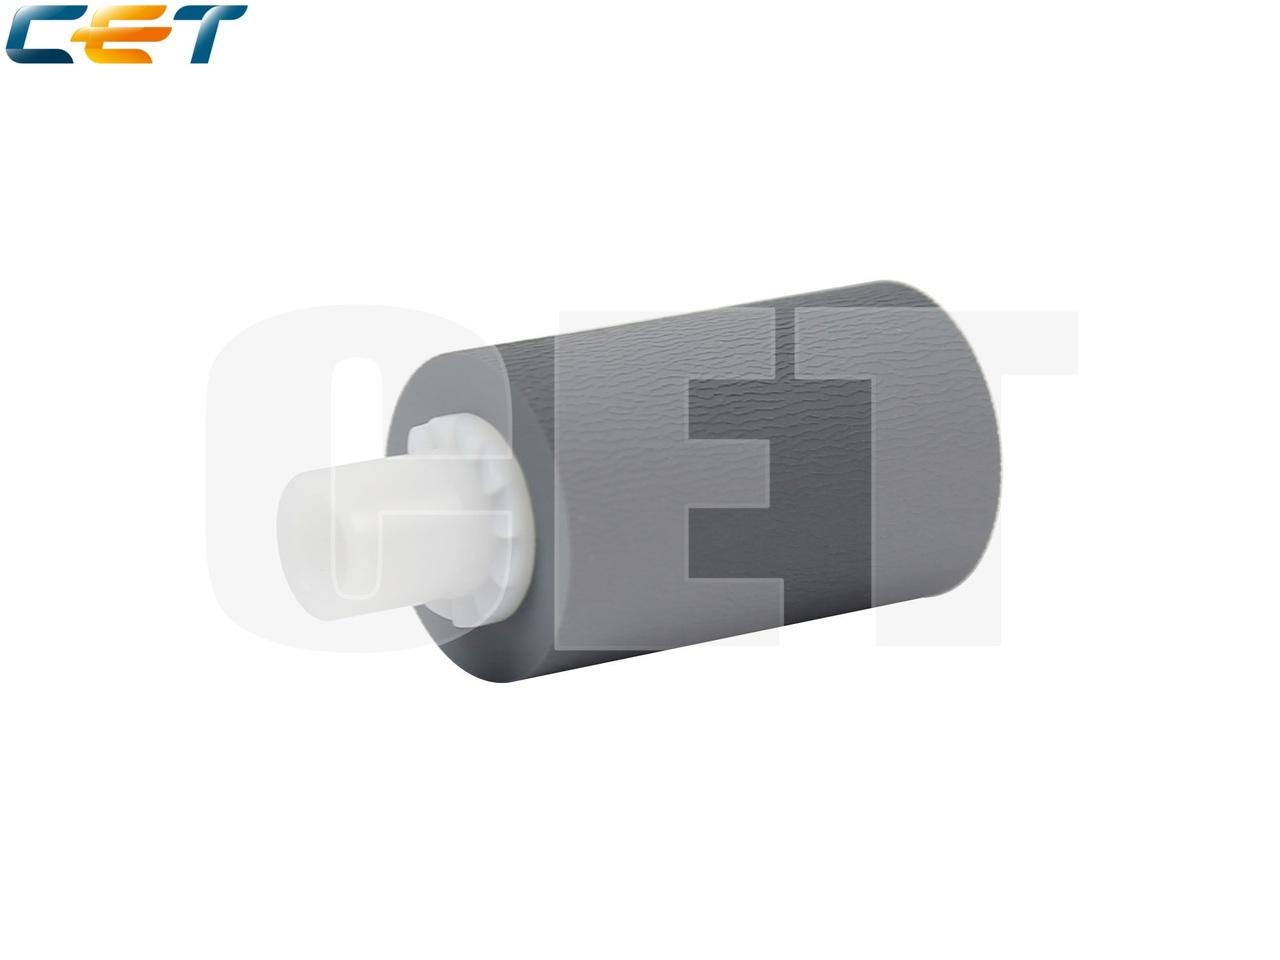 Ролик подхвата ADF D683-2228 для RICOHMP2554SP/MP3054SP/MP3554SP (CET), CET6210